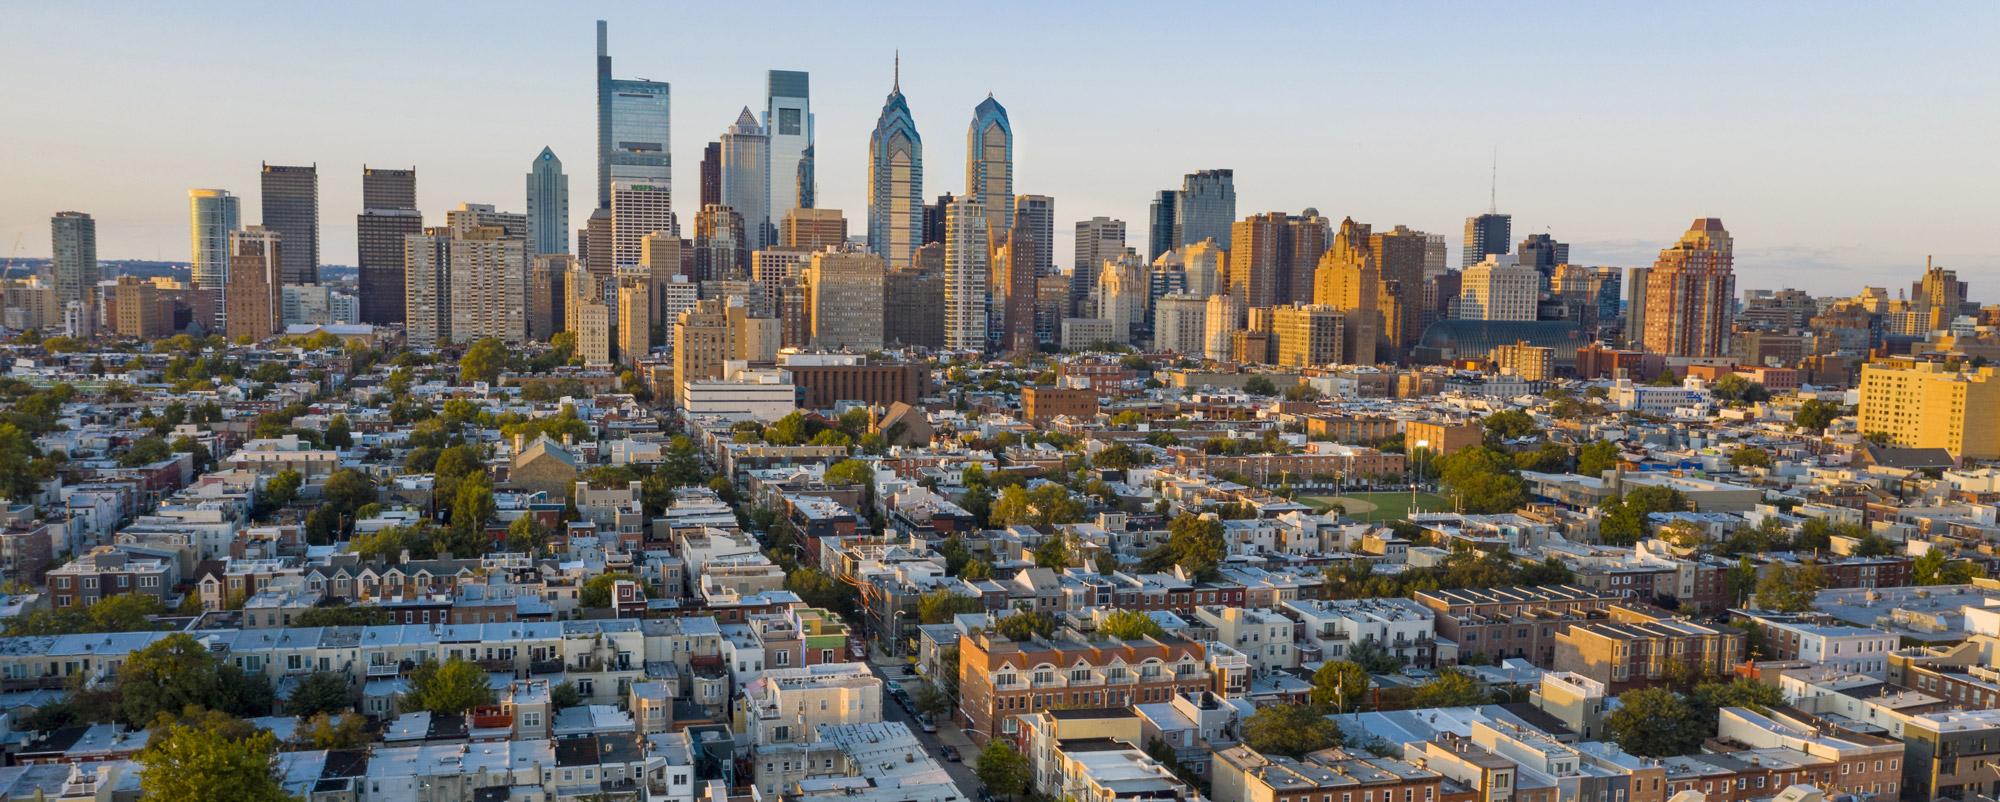 Sun shines on the city of Philadelphia